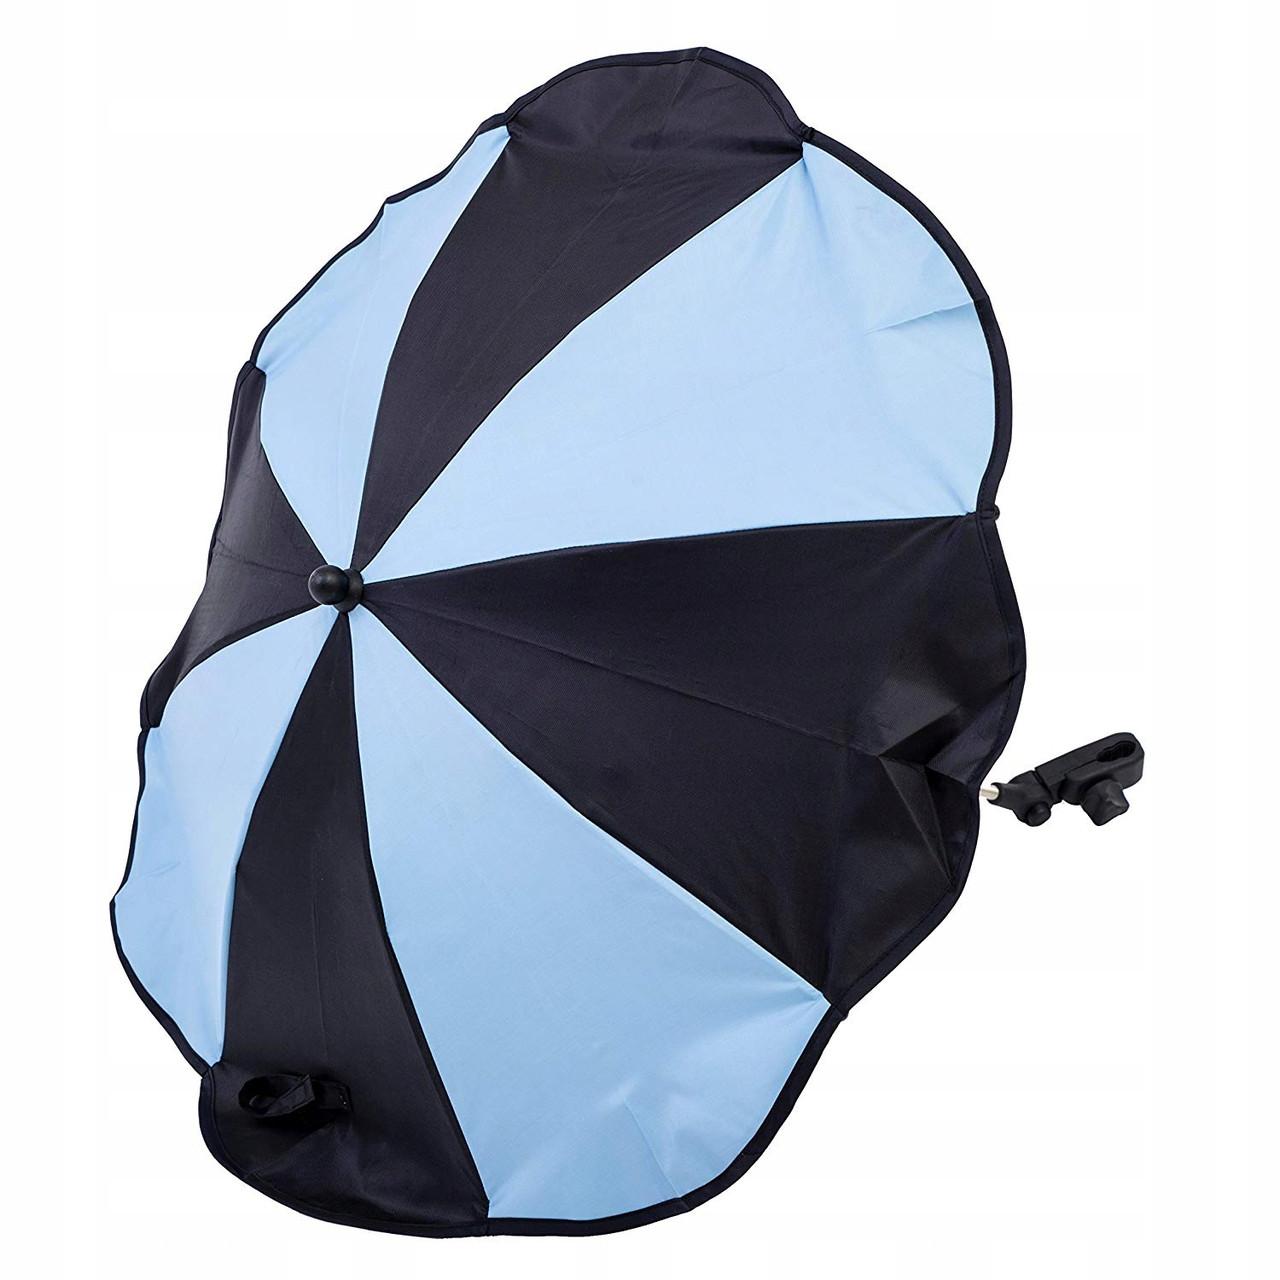 Зонтик для коляски Altabebe (Black/Light Blue)